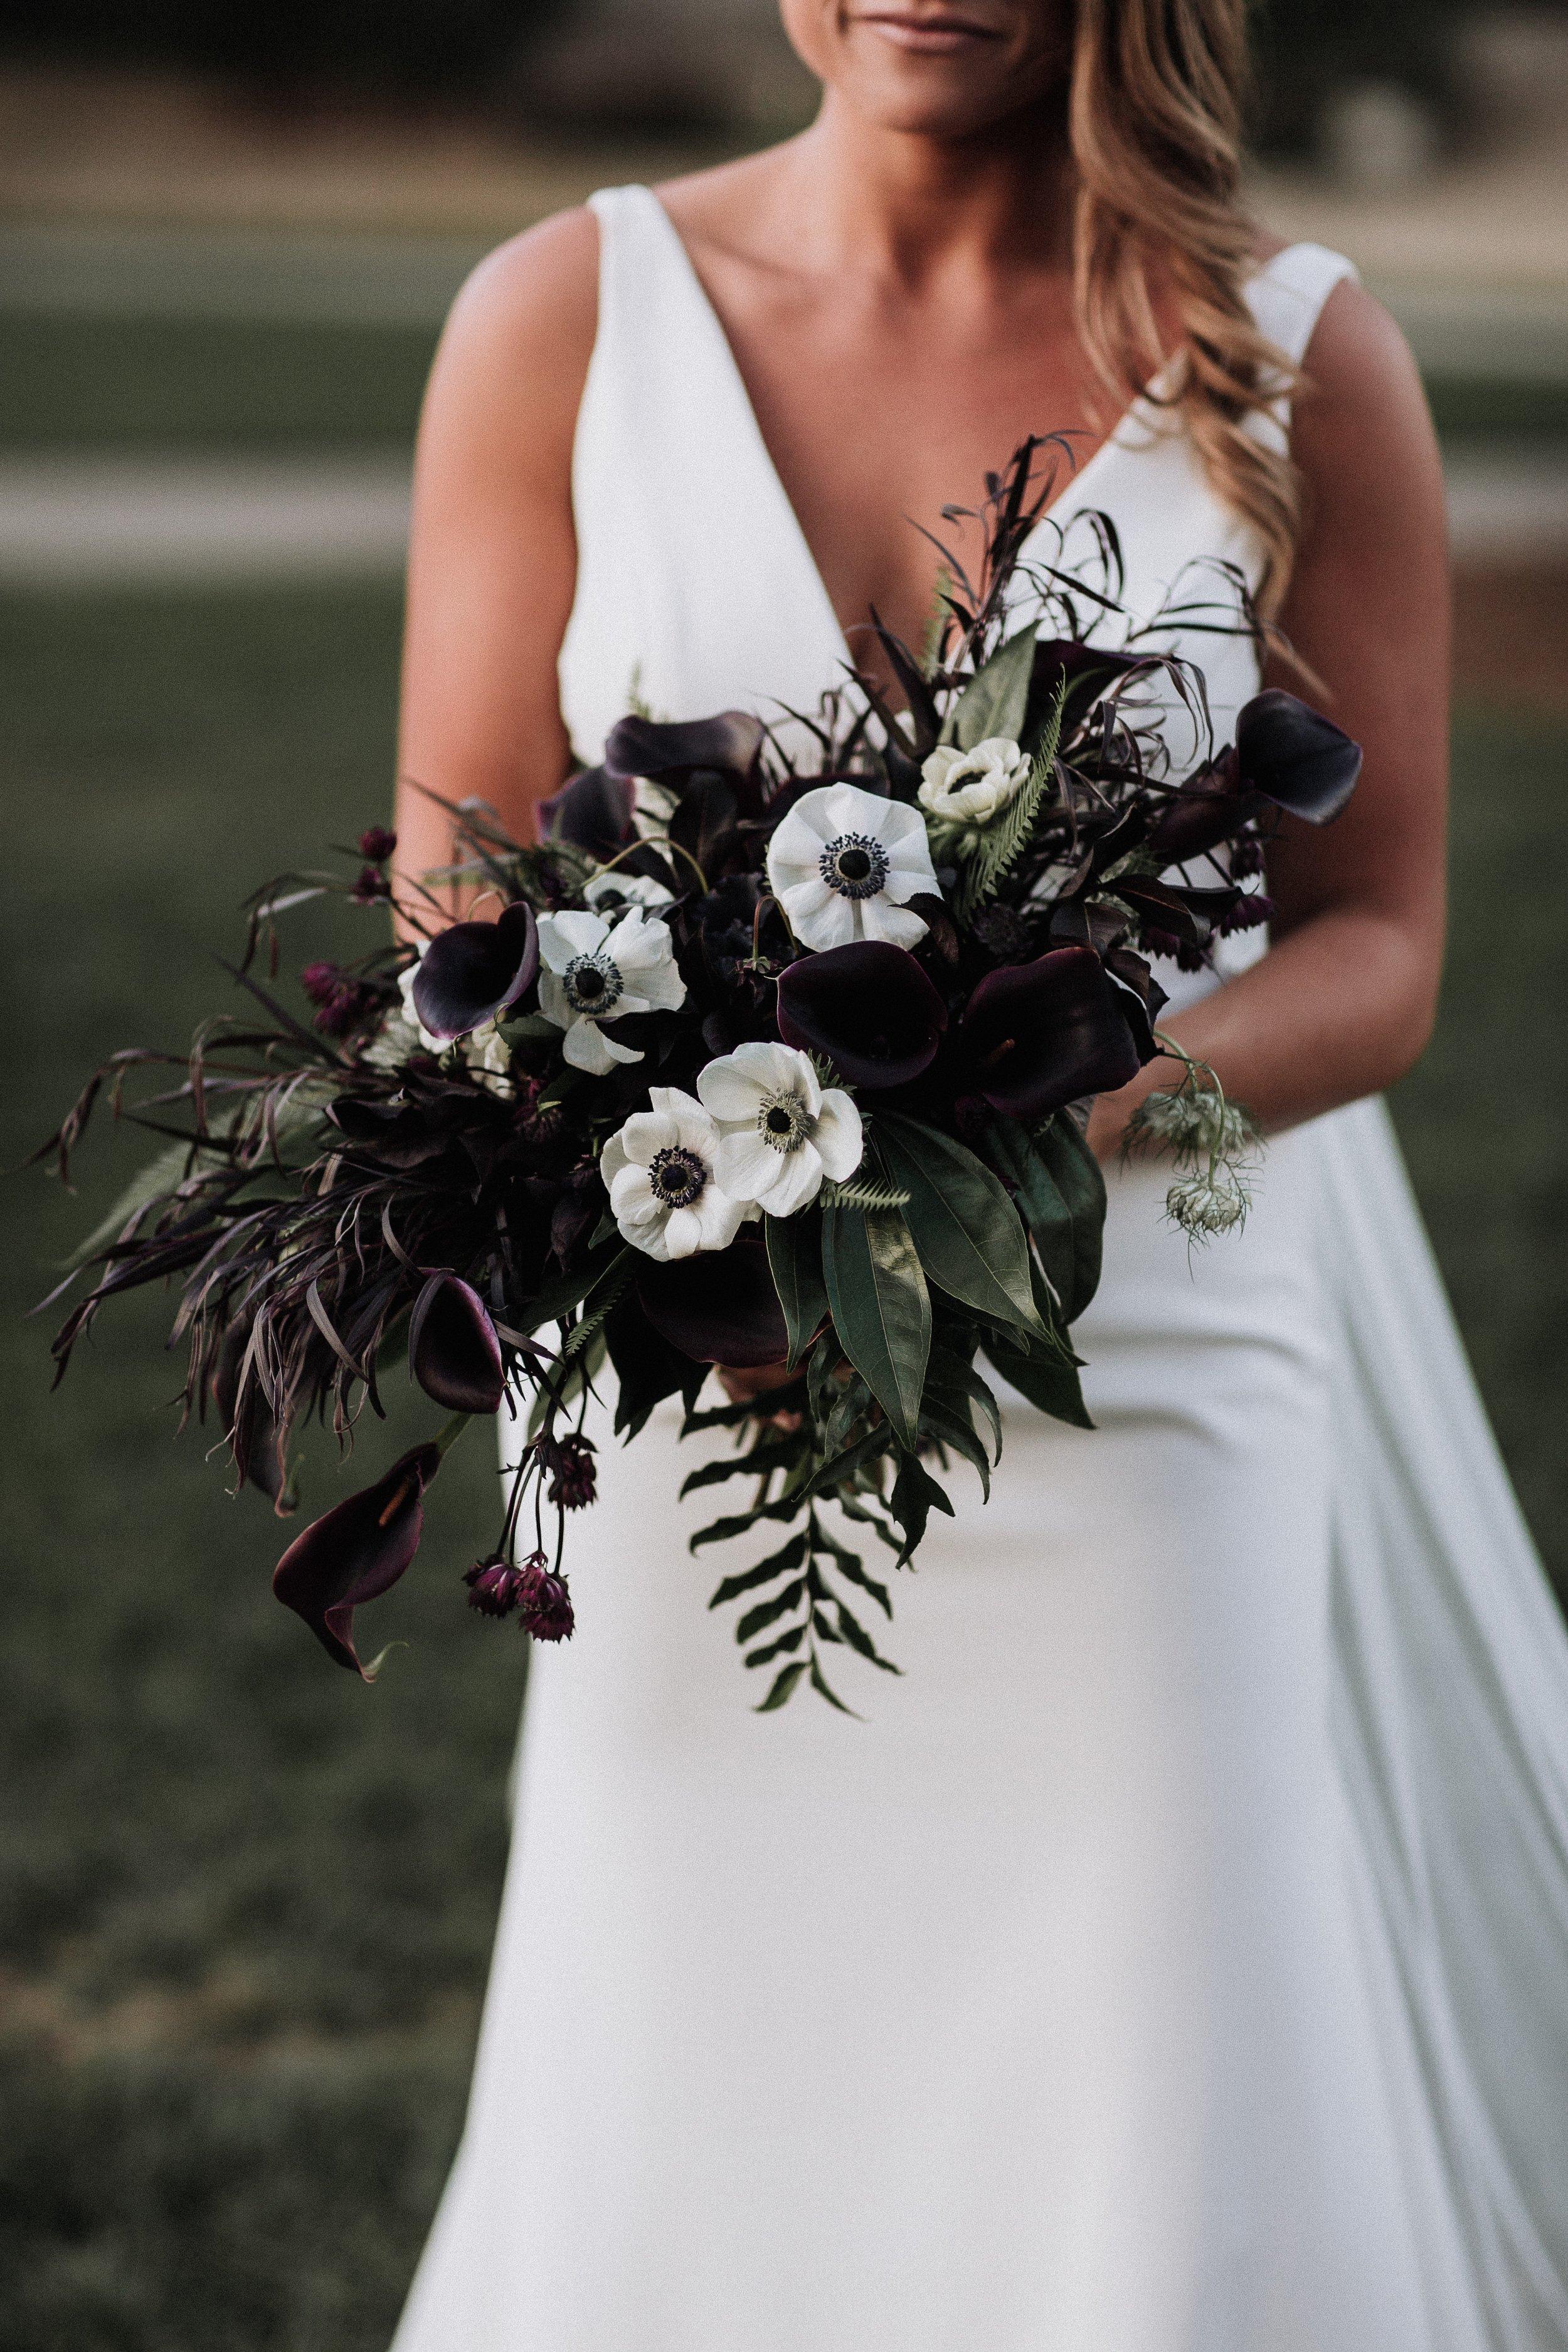 Dark Moody Bridal Bouquet Anemone Black Lily Oakland Museum of California KLdc